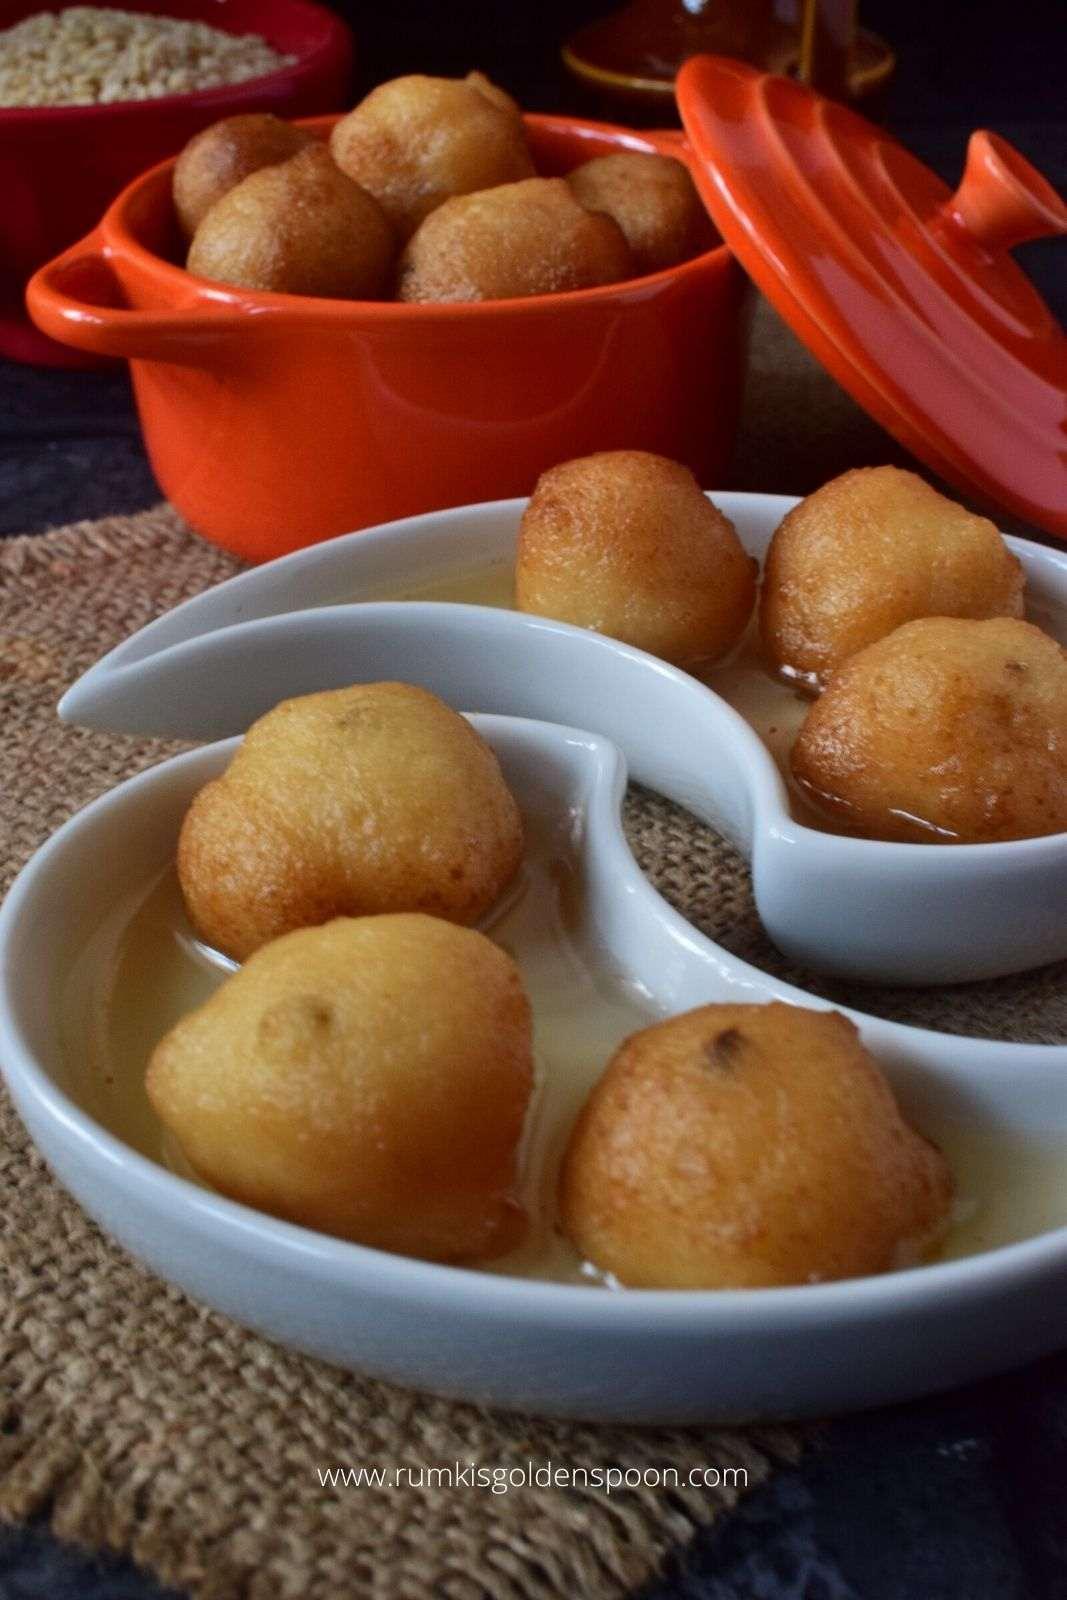 rosh bora, rosh bora recipe, rosh bora pitha, bengali rosh bora, how to make rosh bora, rosh fuluri, bengali pitha, bengali pitha recipe, bengali pithe, bengali pitha puli, bengali pithe puli, bangladeshi pitha, makar sankranti food, makar sankranti food items, bengali sweet recipe, makar sankranti special food, makar sankranti food recipes, makar sankranti festival food, makar sankranti traditional food, bengali recipe, bengali food, Rumki's Golden Spoon